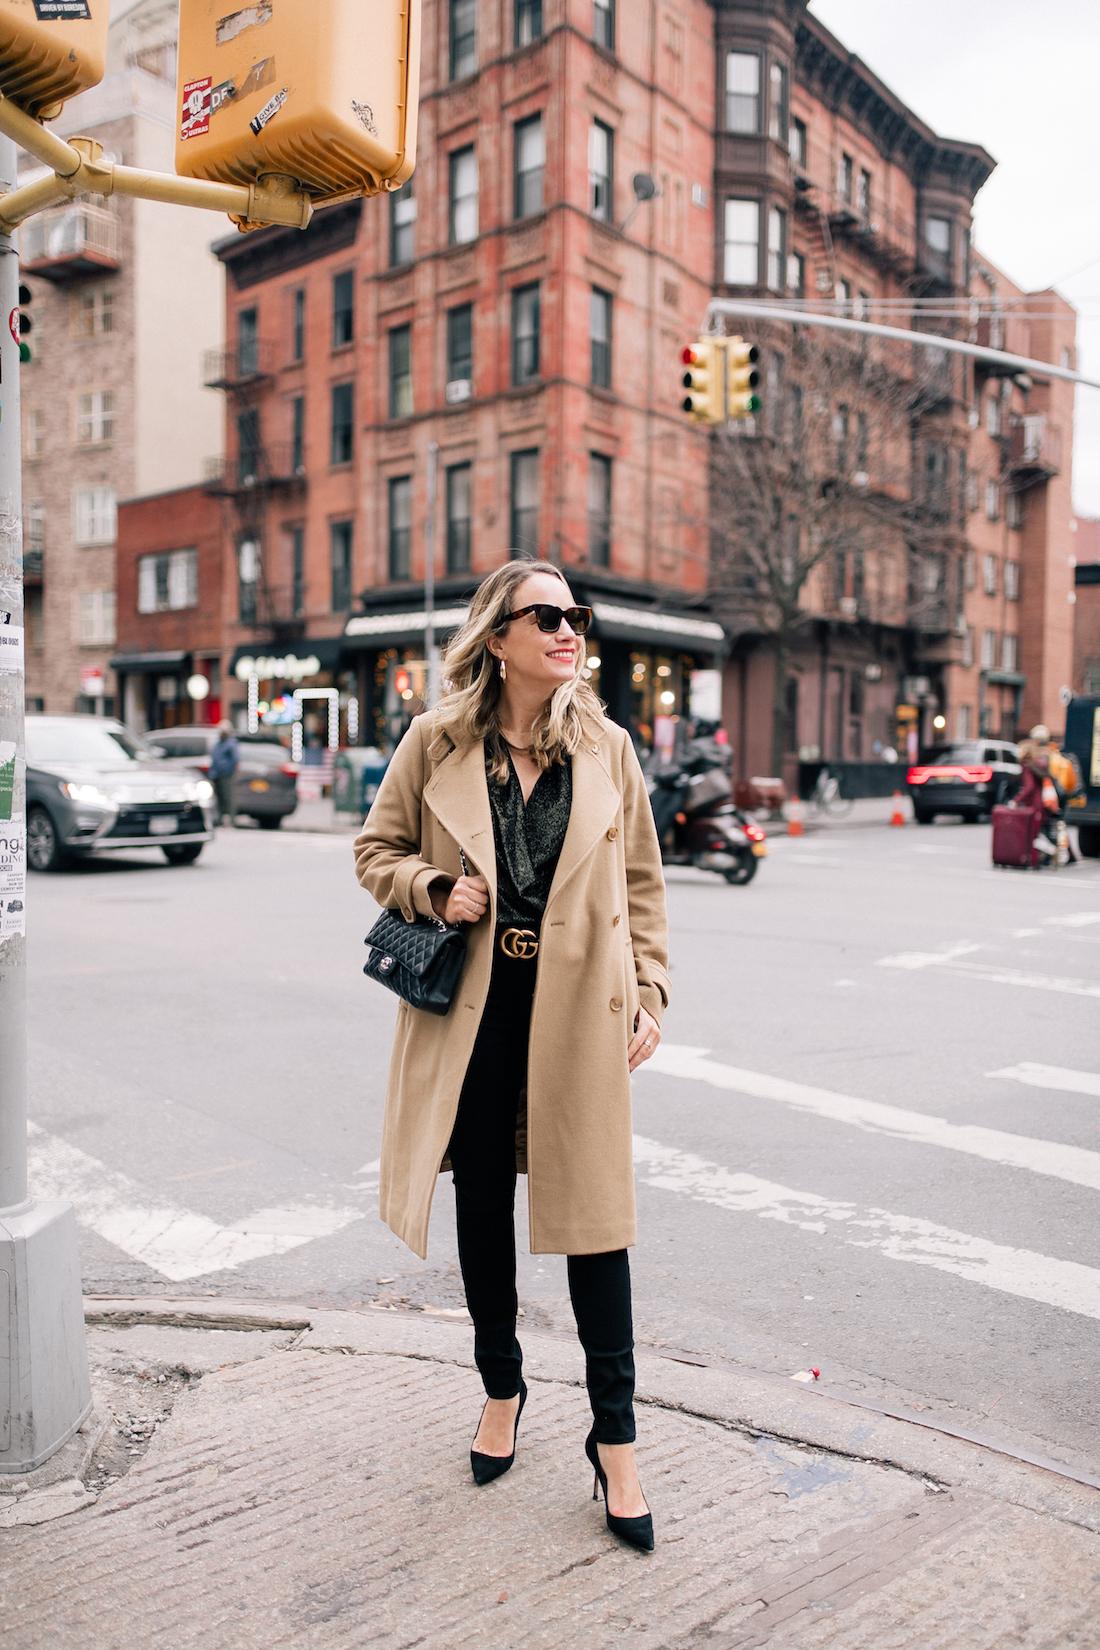 Camel Coat - Black outfit & gucci belt and chanel bag